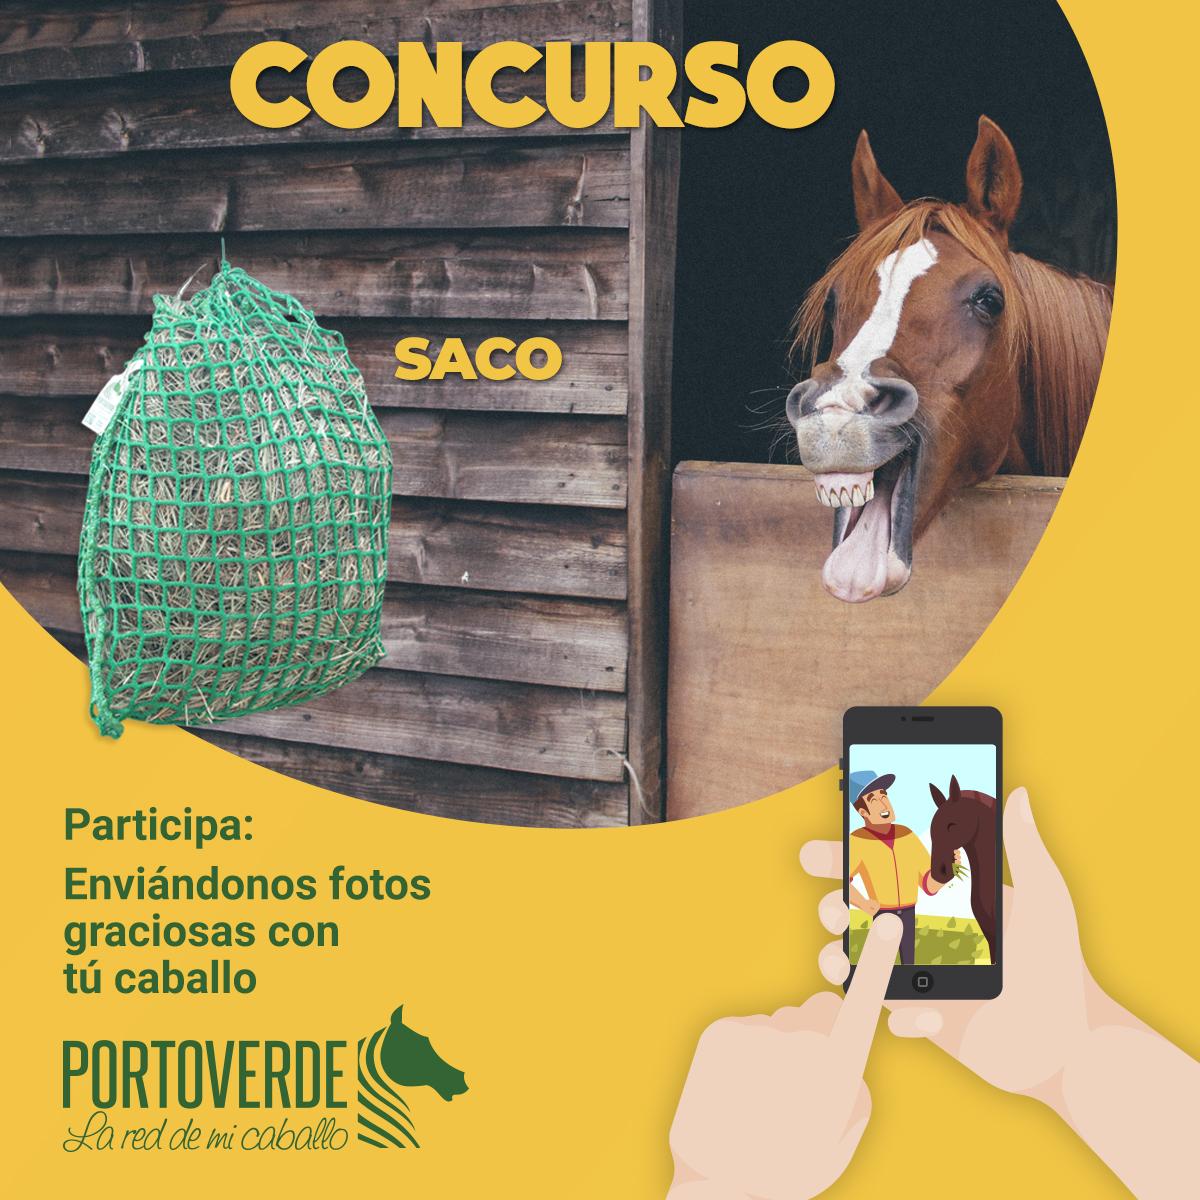 Concurso fotográfico Portoverde